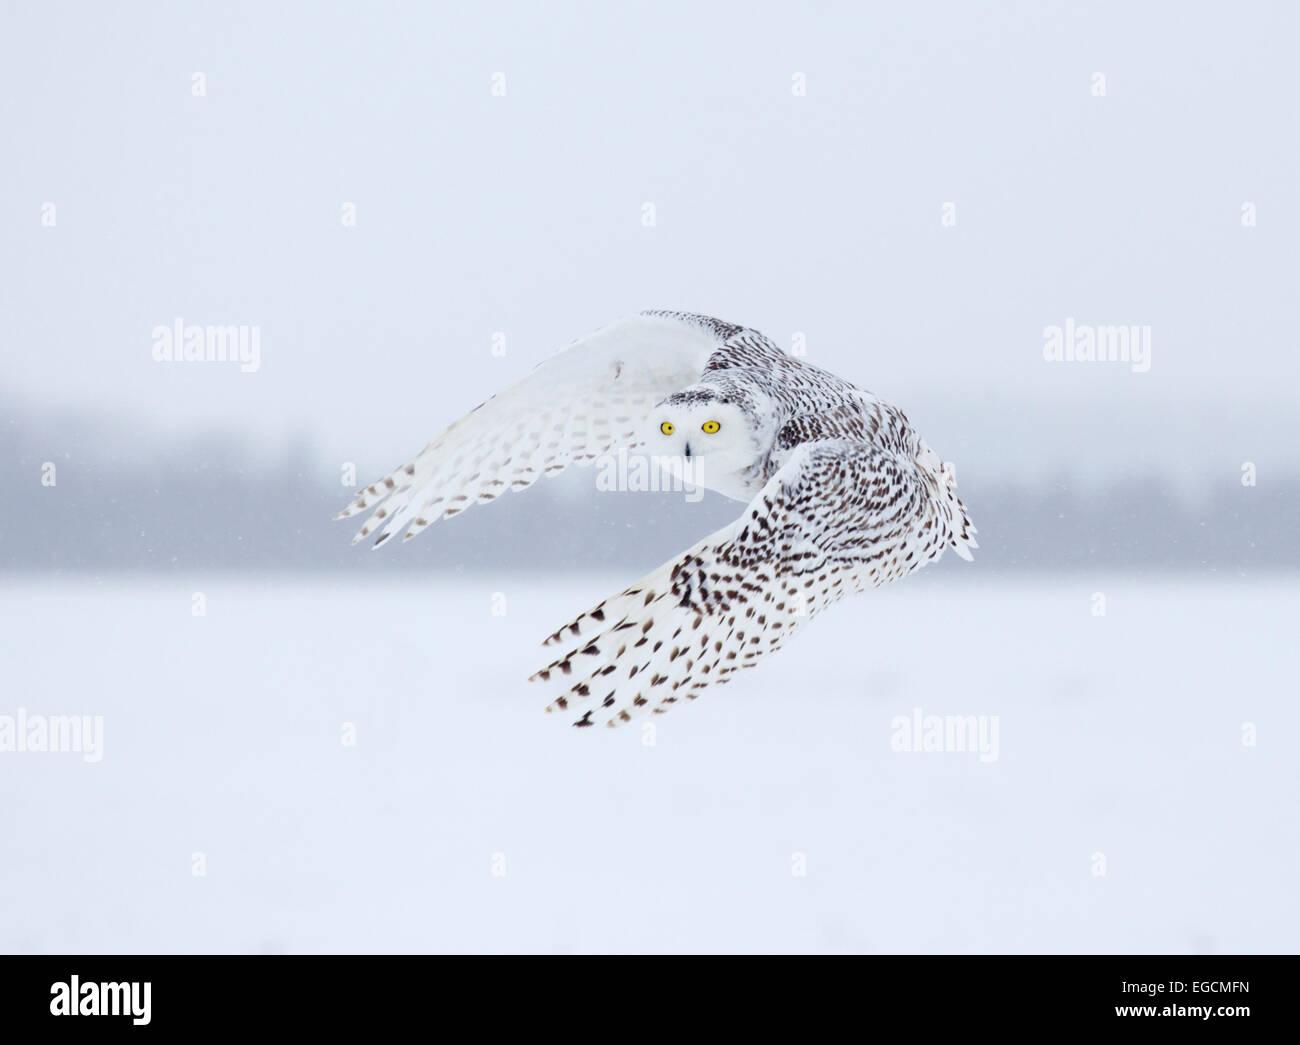 Snowy Owl in Flight - Stock Image